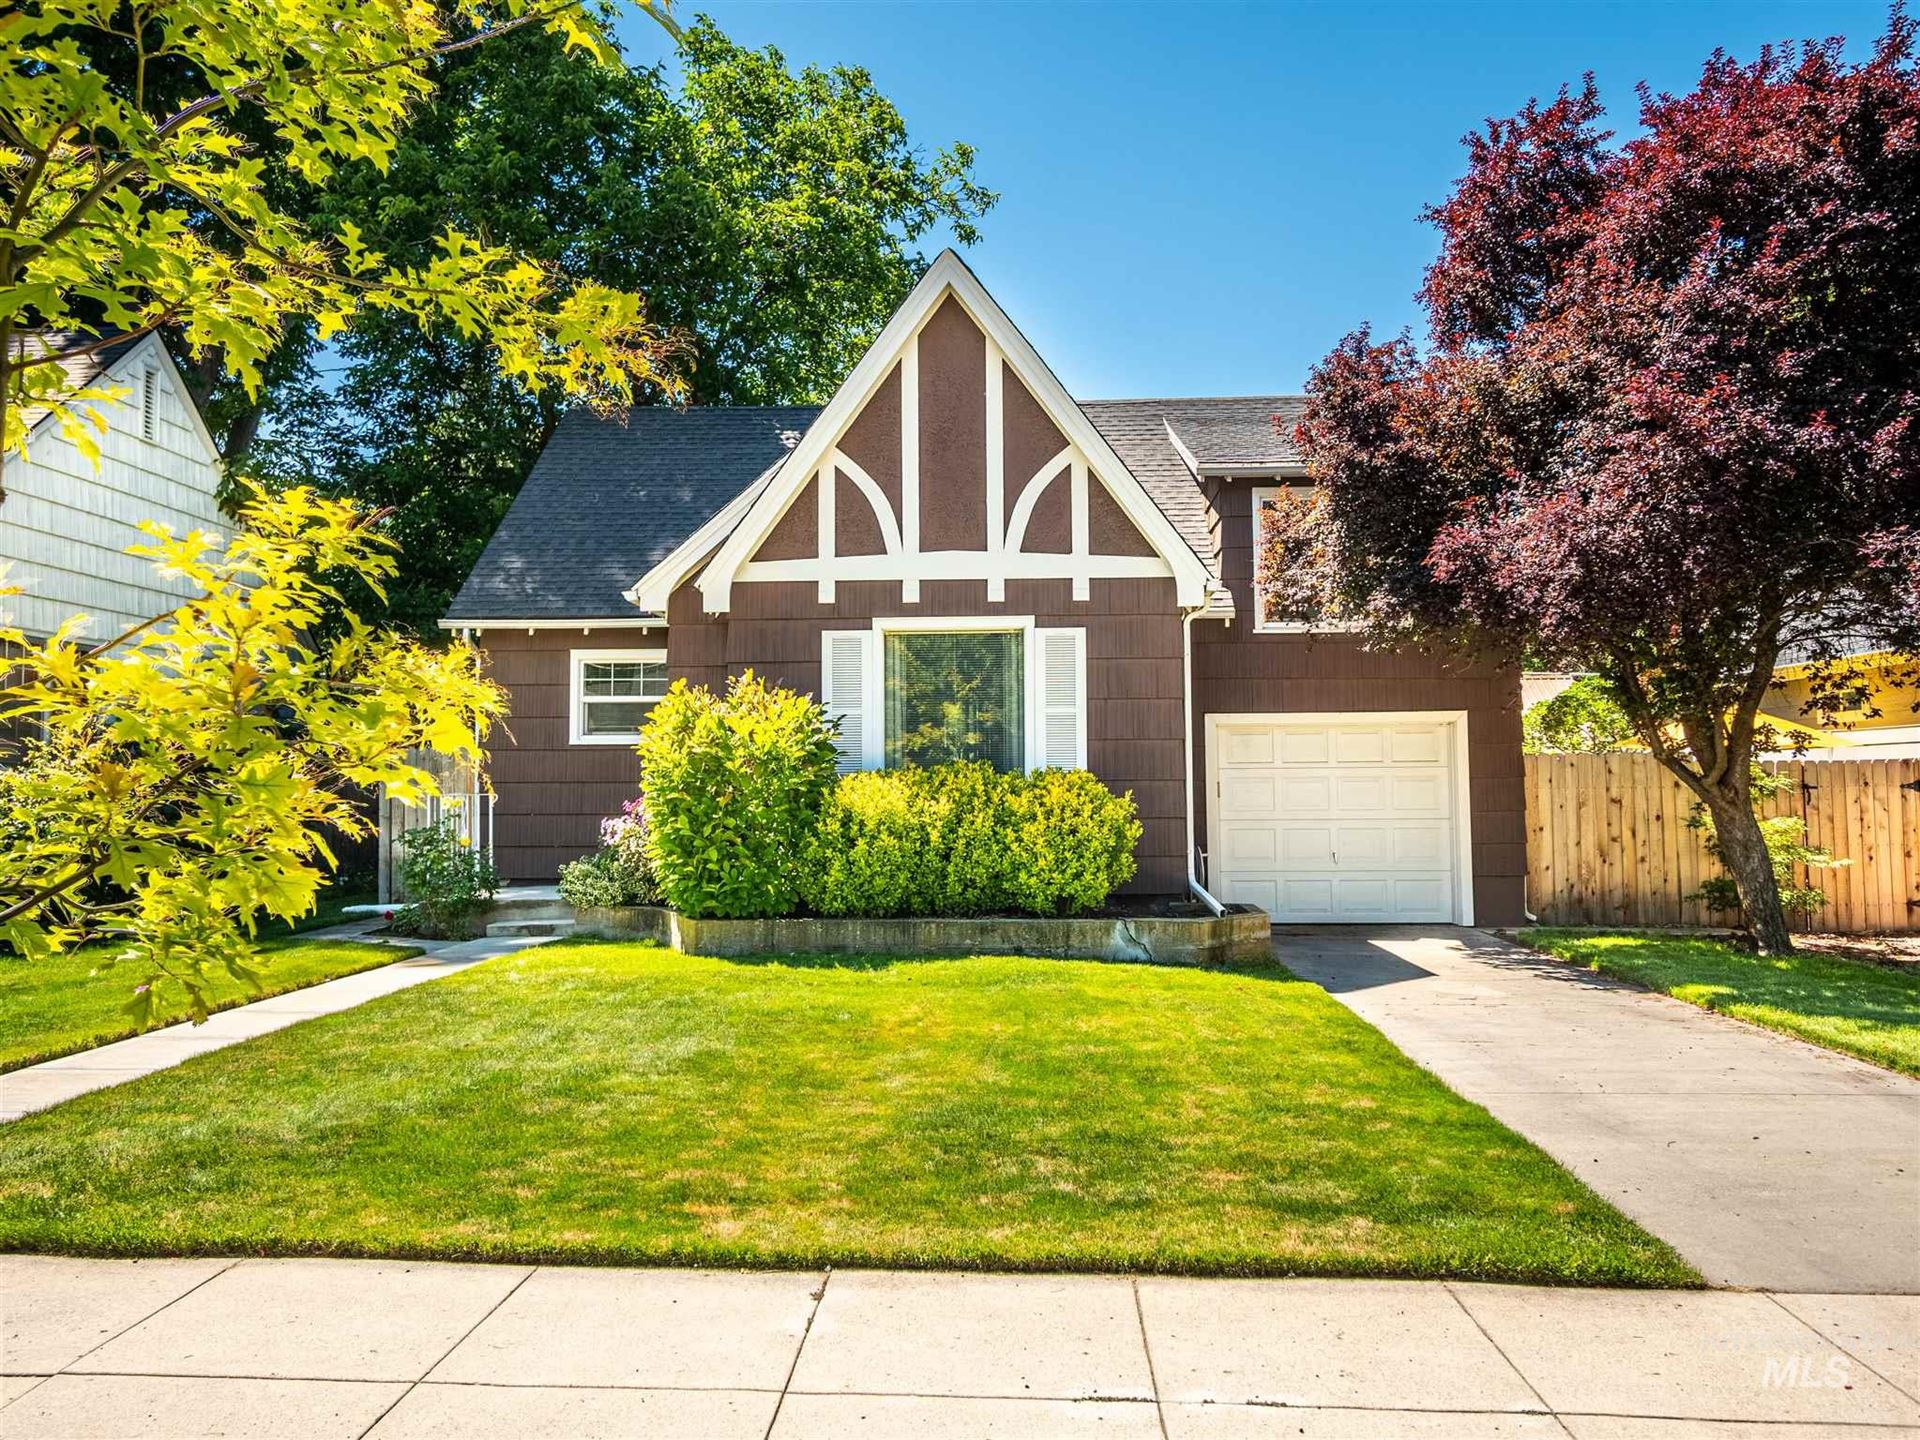 2119 W Pleasanton, Boise, ID 83702 - MLS#: 98771434